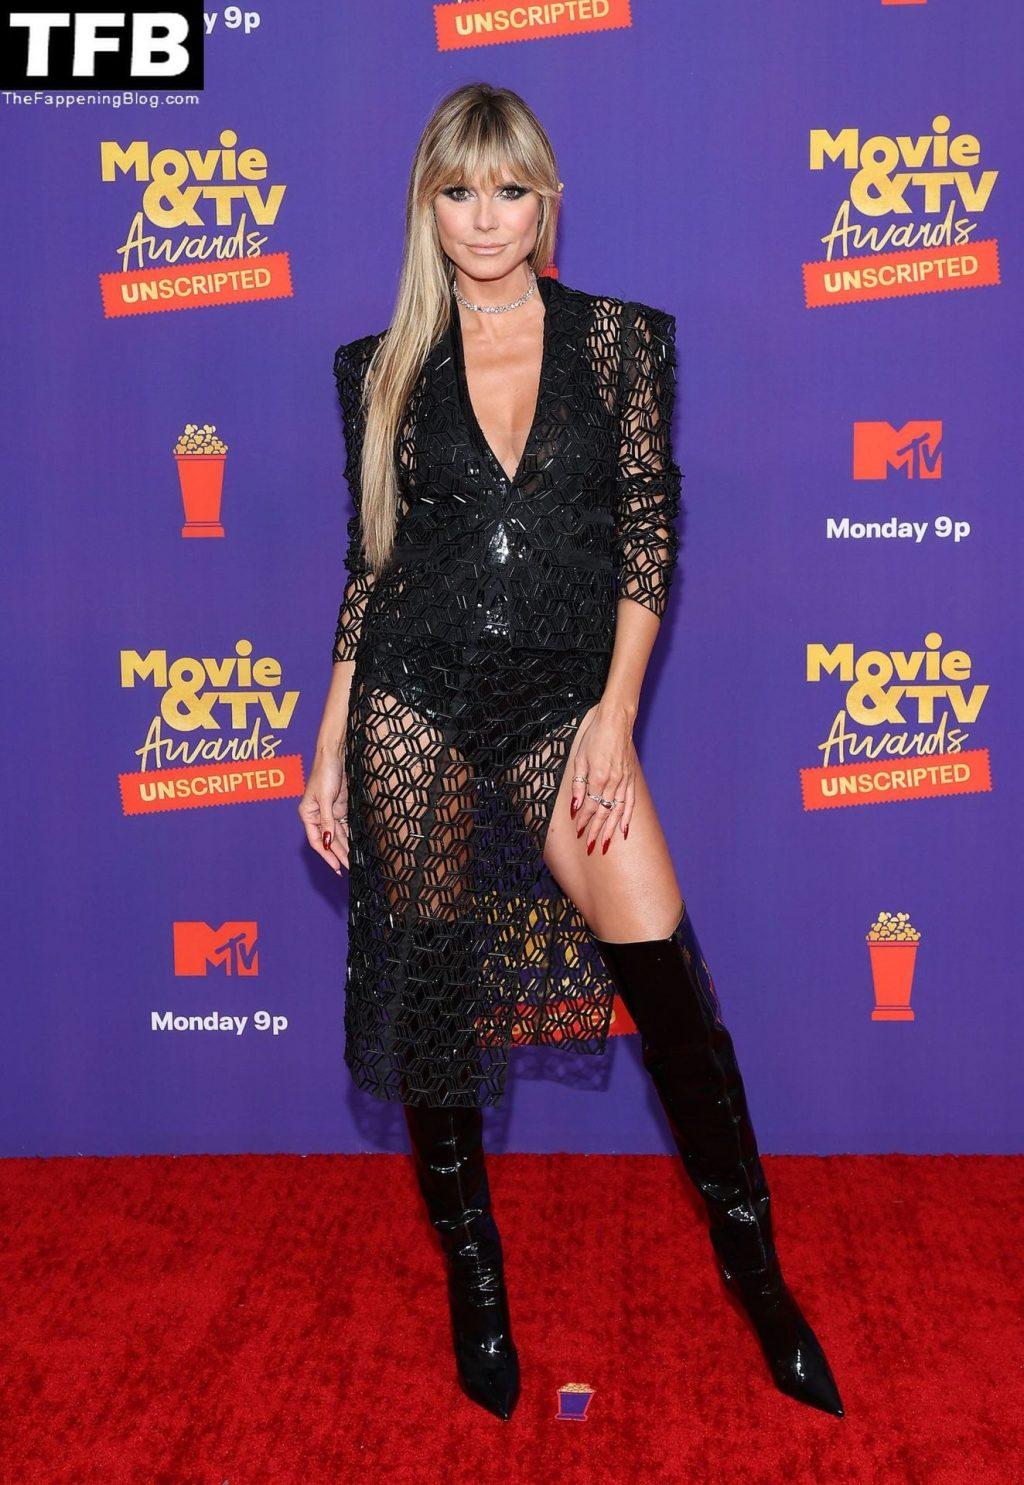 Heidi Klum Sexy (6 Hot Photos)